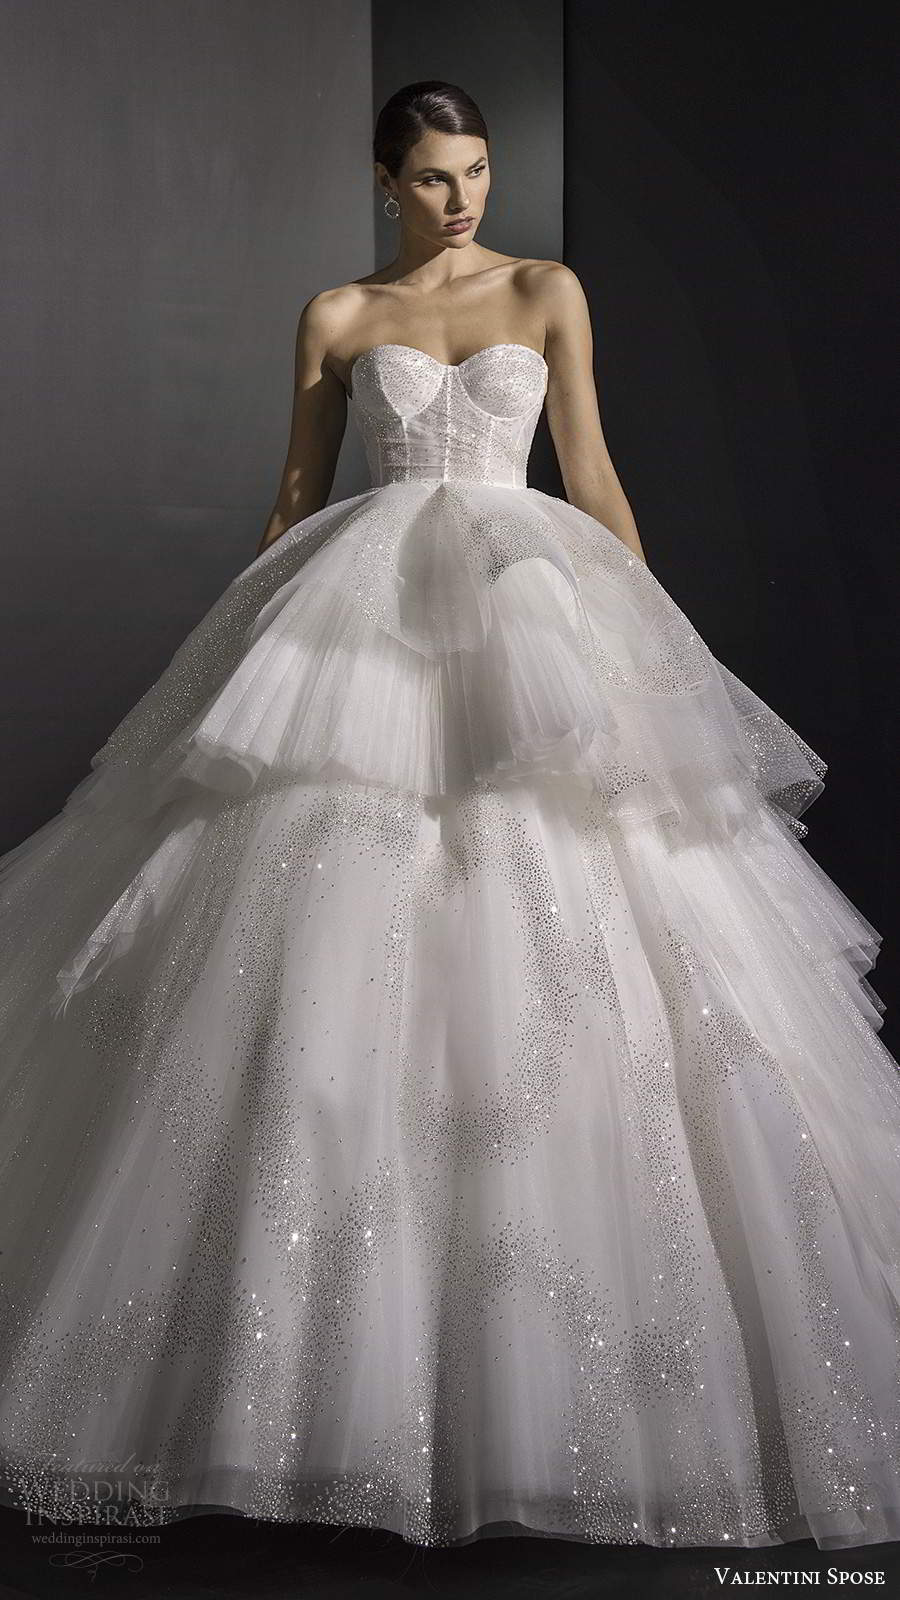 valentini spose fall 2020 bridal strapless sweetheart neckline sheer corset bodice fully embellished glitzy a line ball gown wedding dress chapel train (10) mv